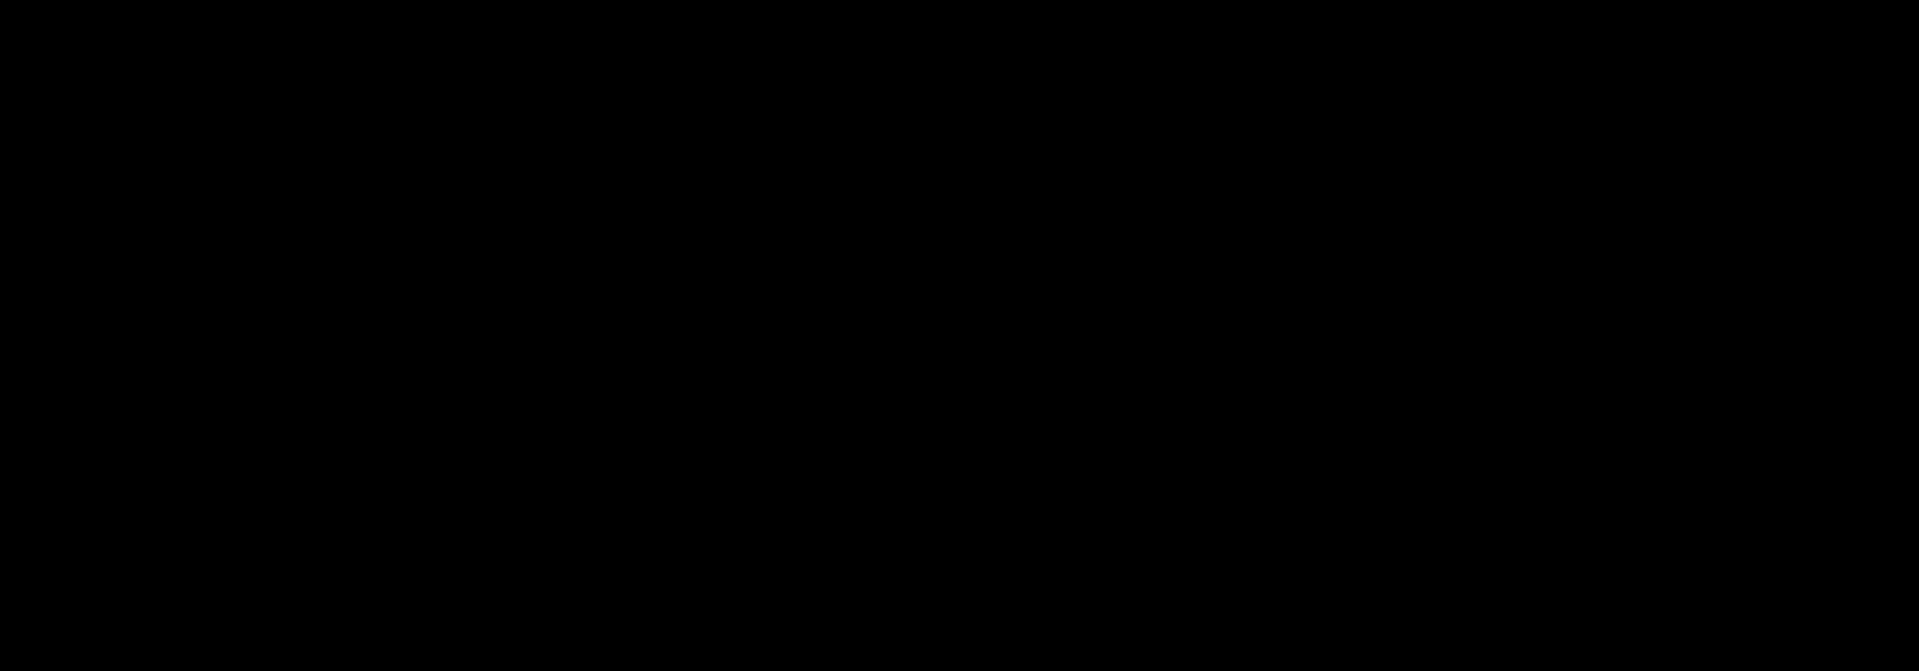 jbc-resale-black